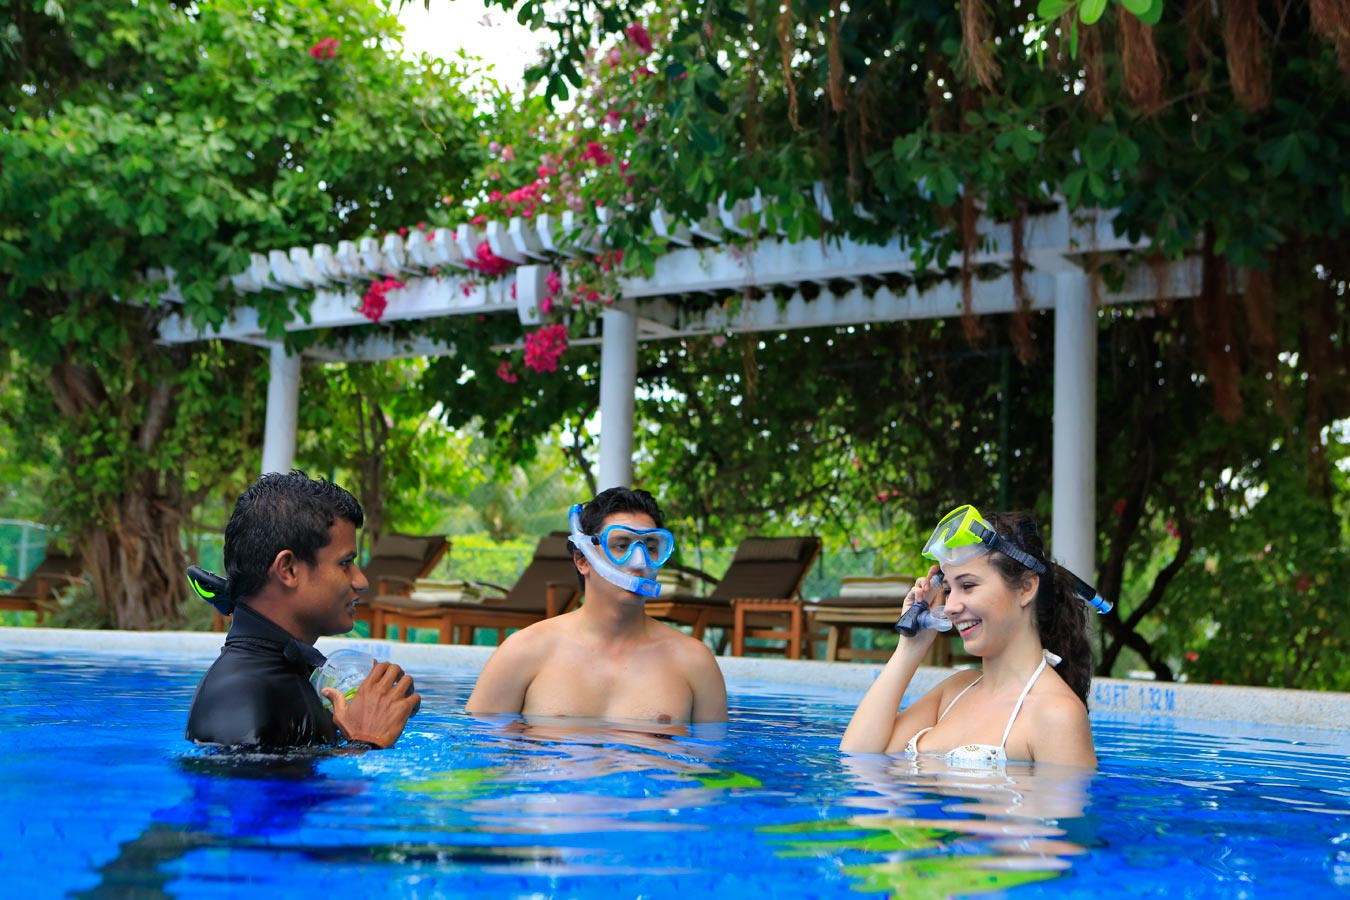 Snorkelling Lesson in the Maldives Islands image| Kurumba Maldives Resort